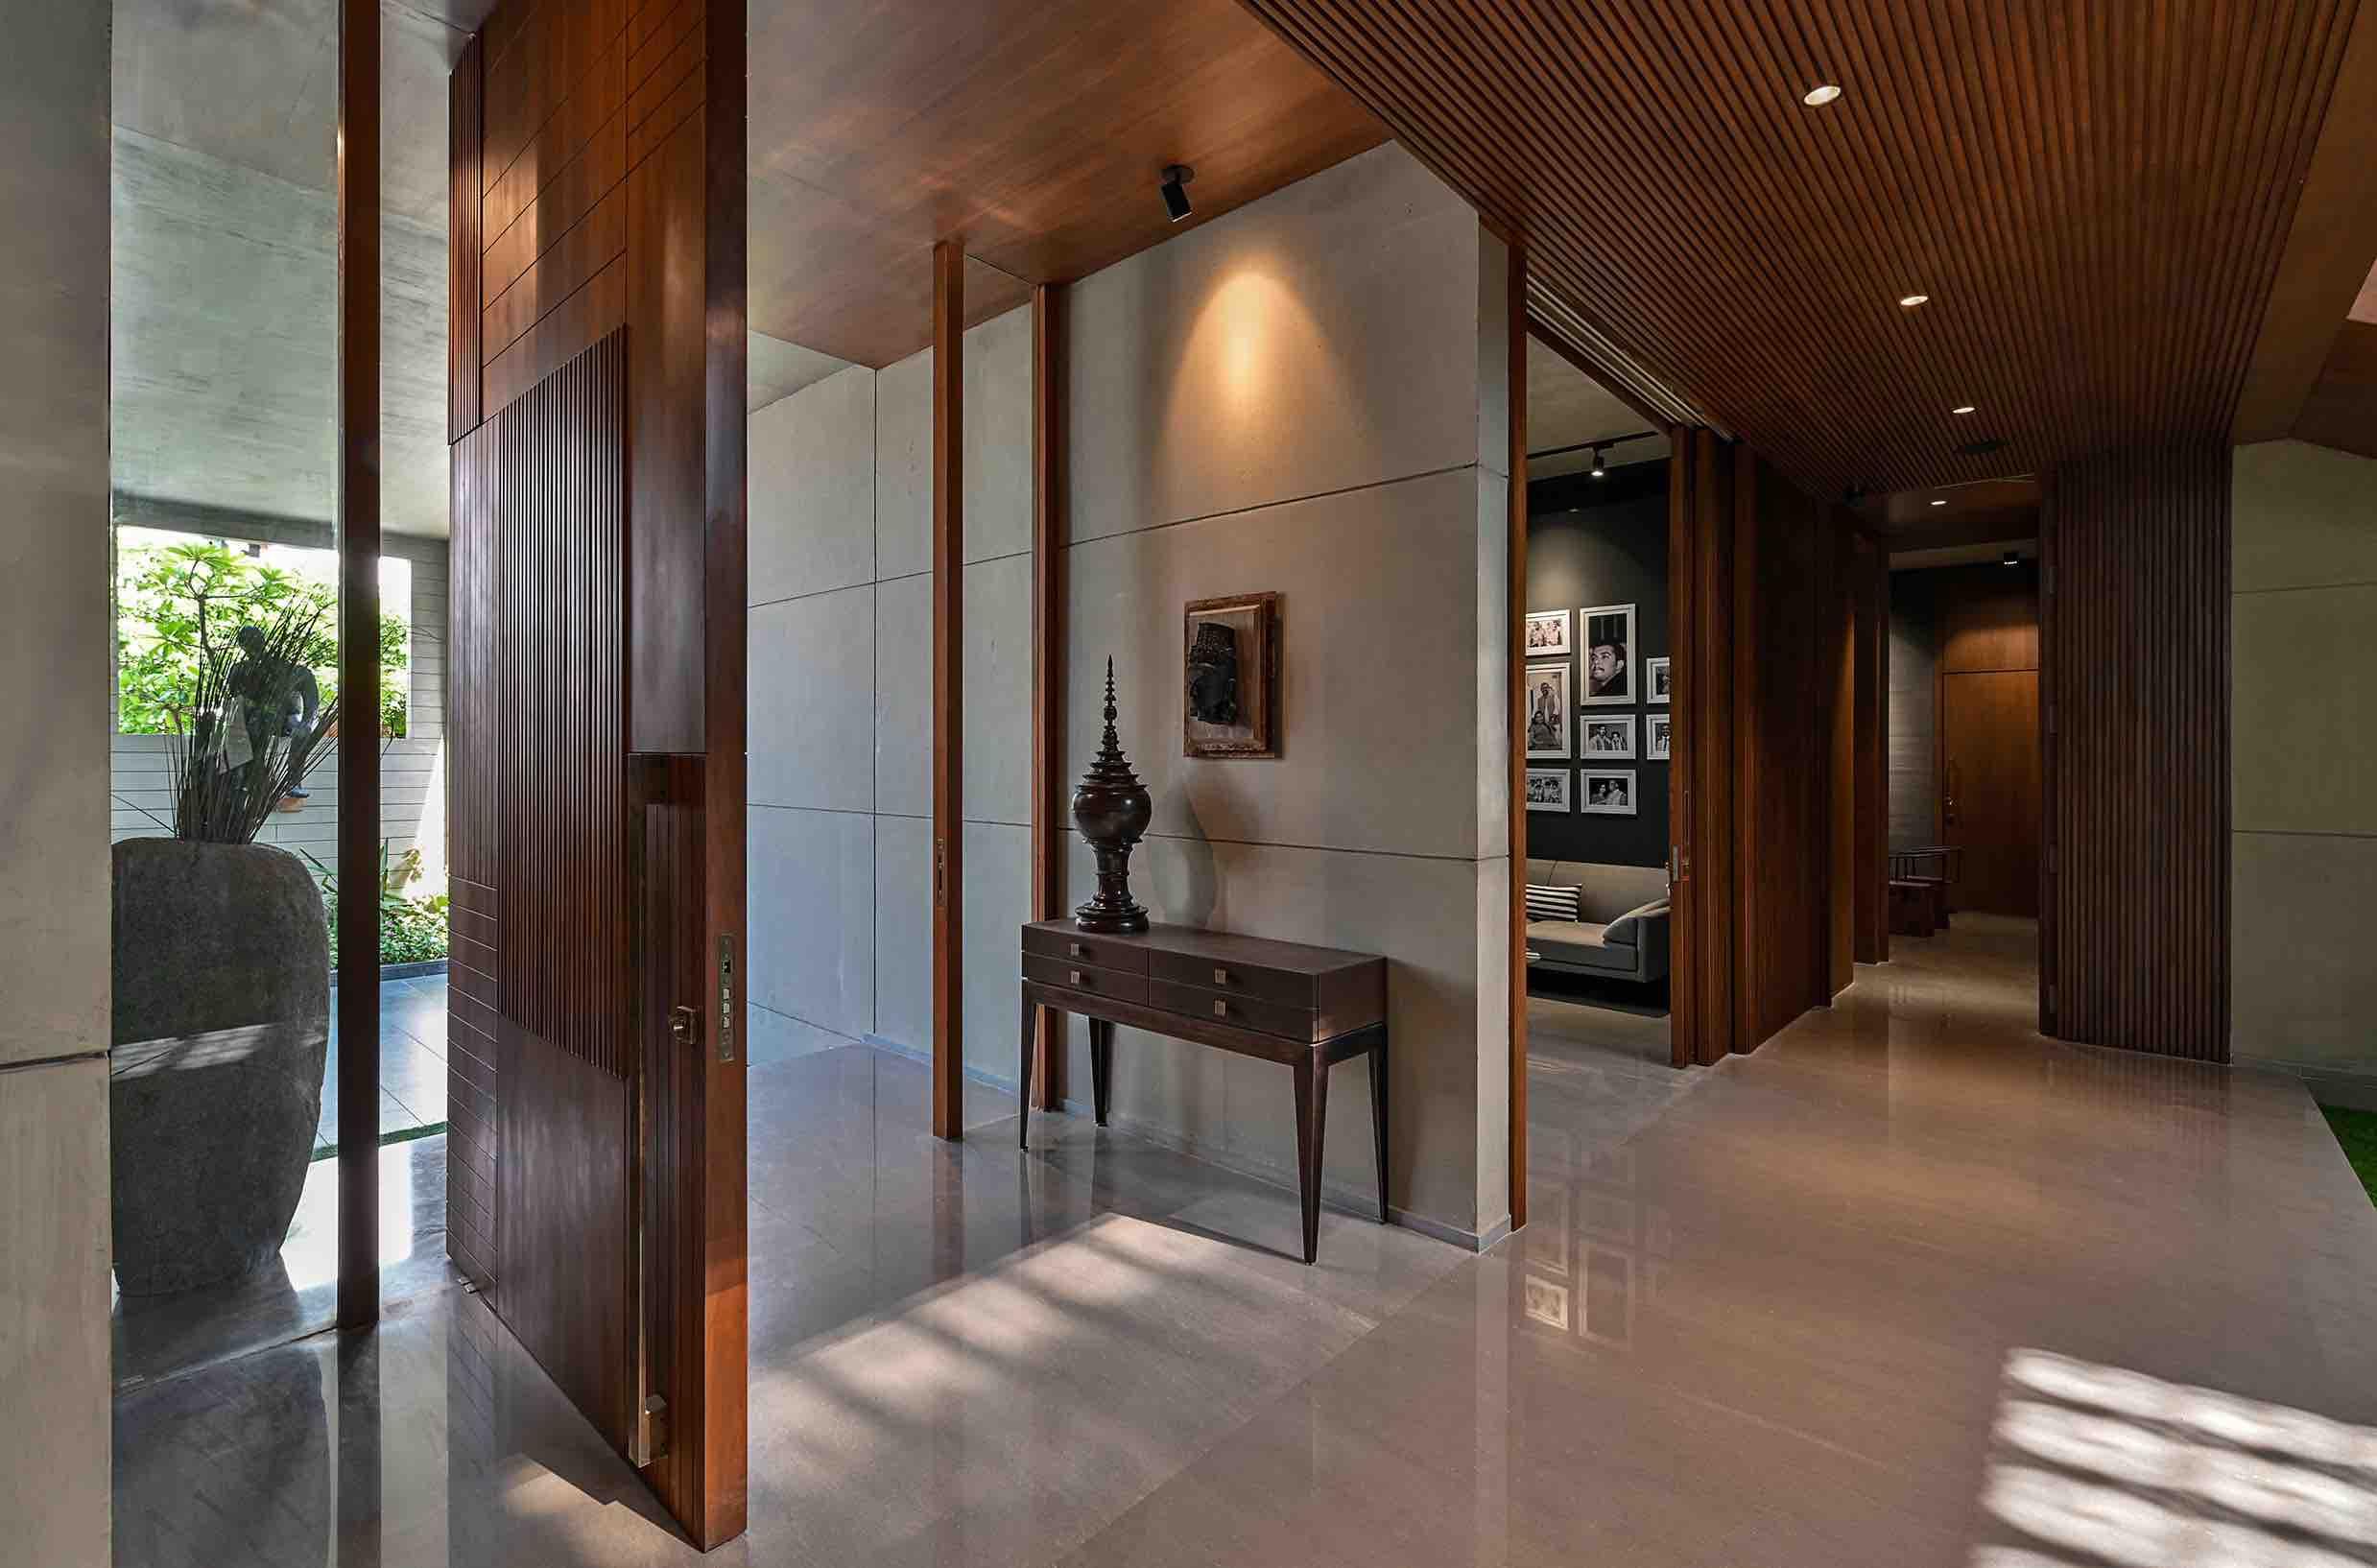 18_Screens_Sanjay_Puri_architects_india_amazingarchitecture_019.jpg